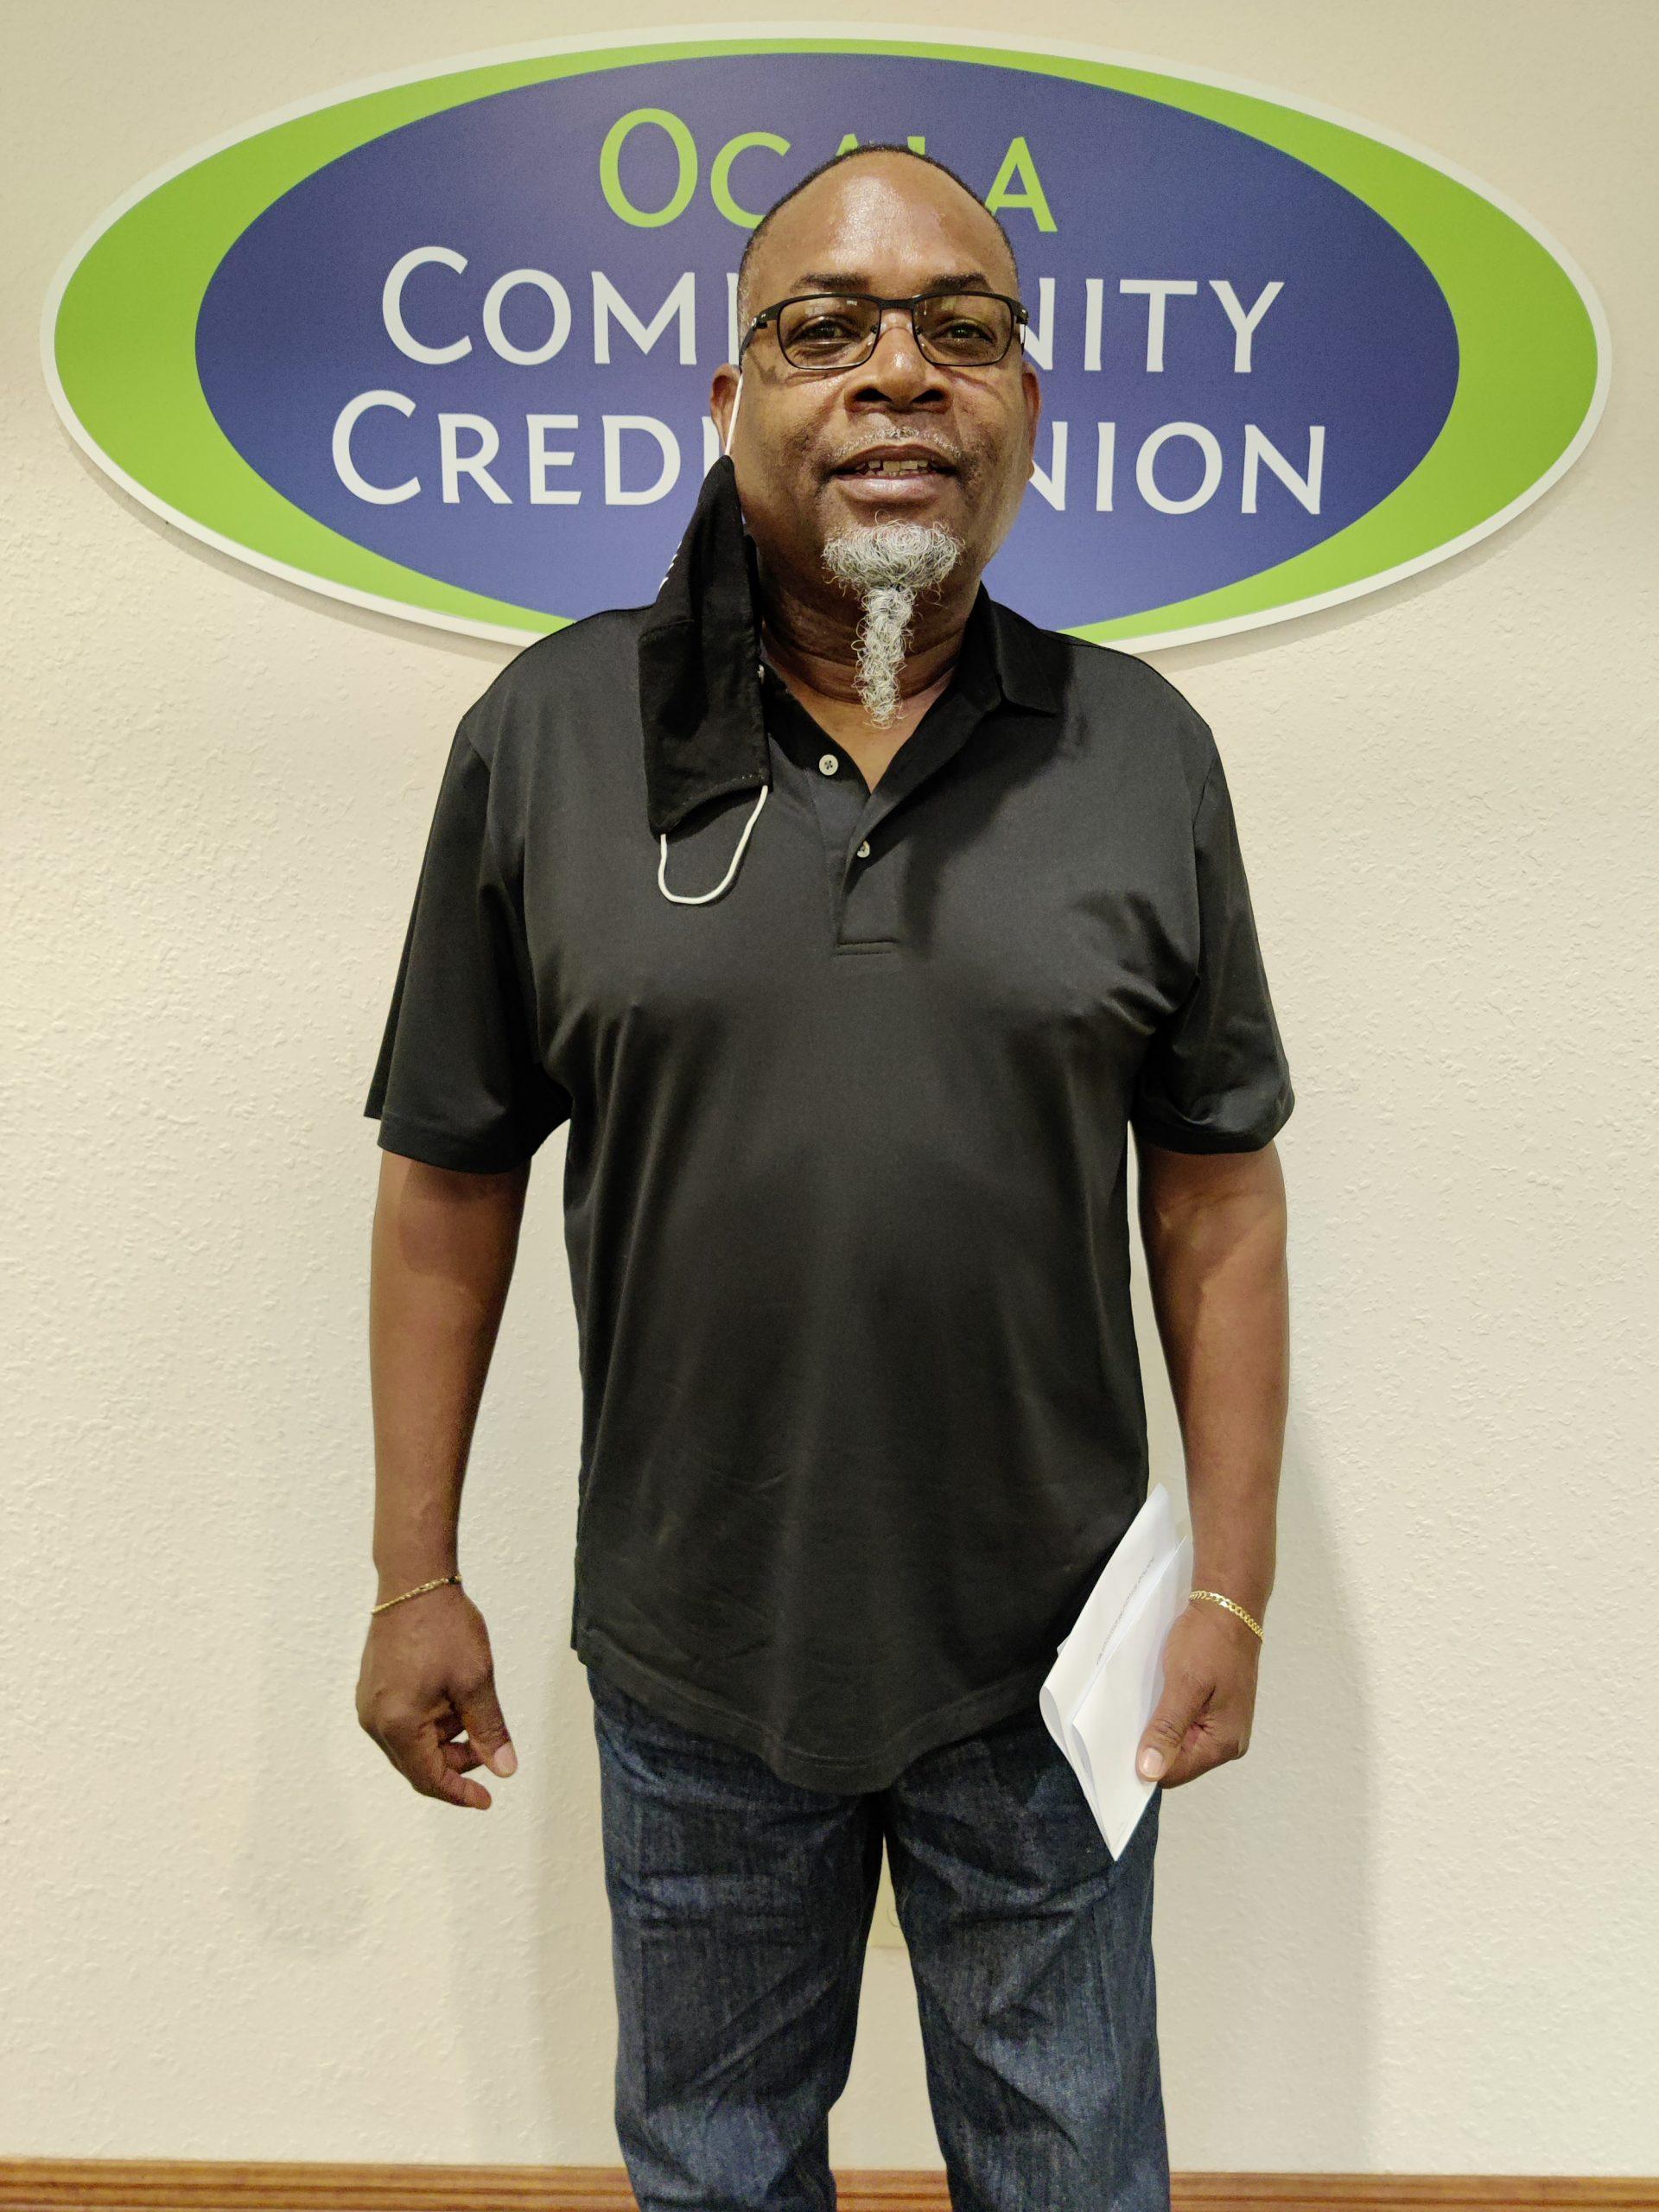 06-29-2021 Joe Davis just retired from City of Ocala